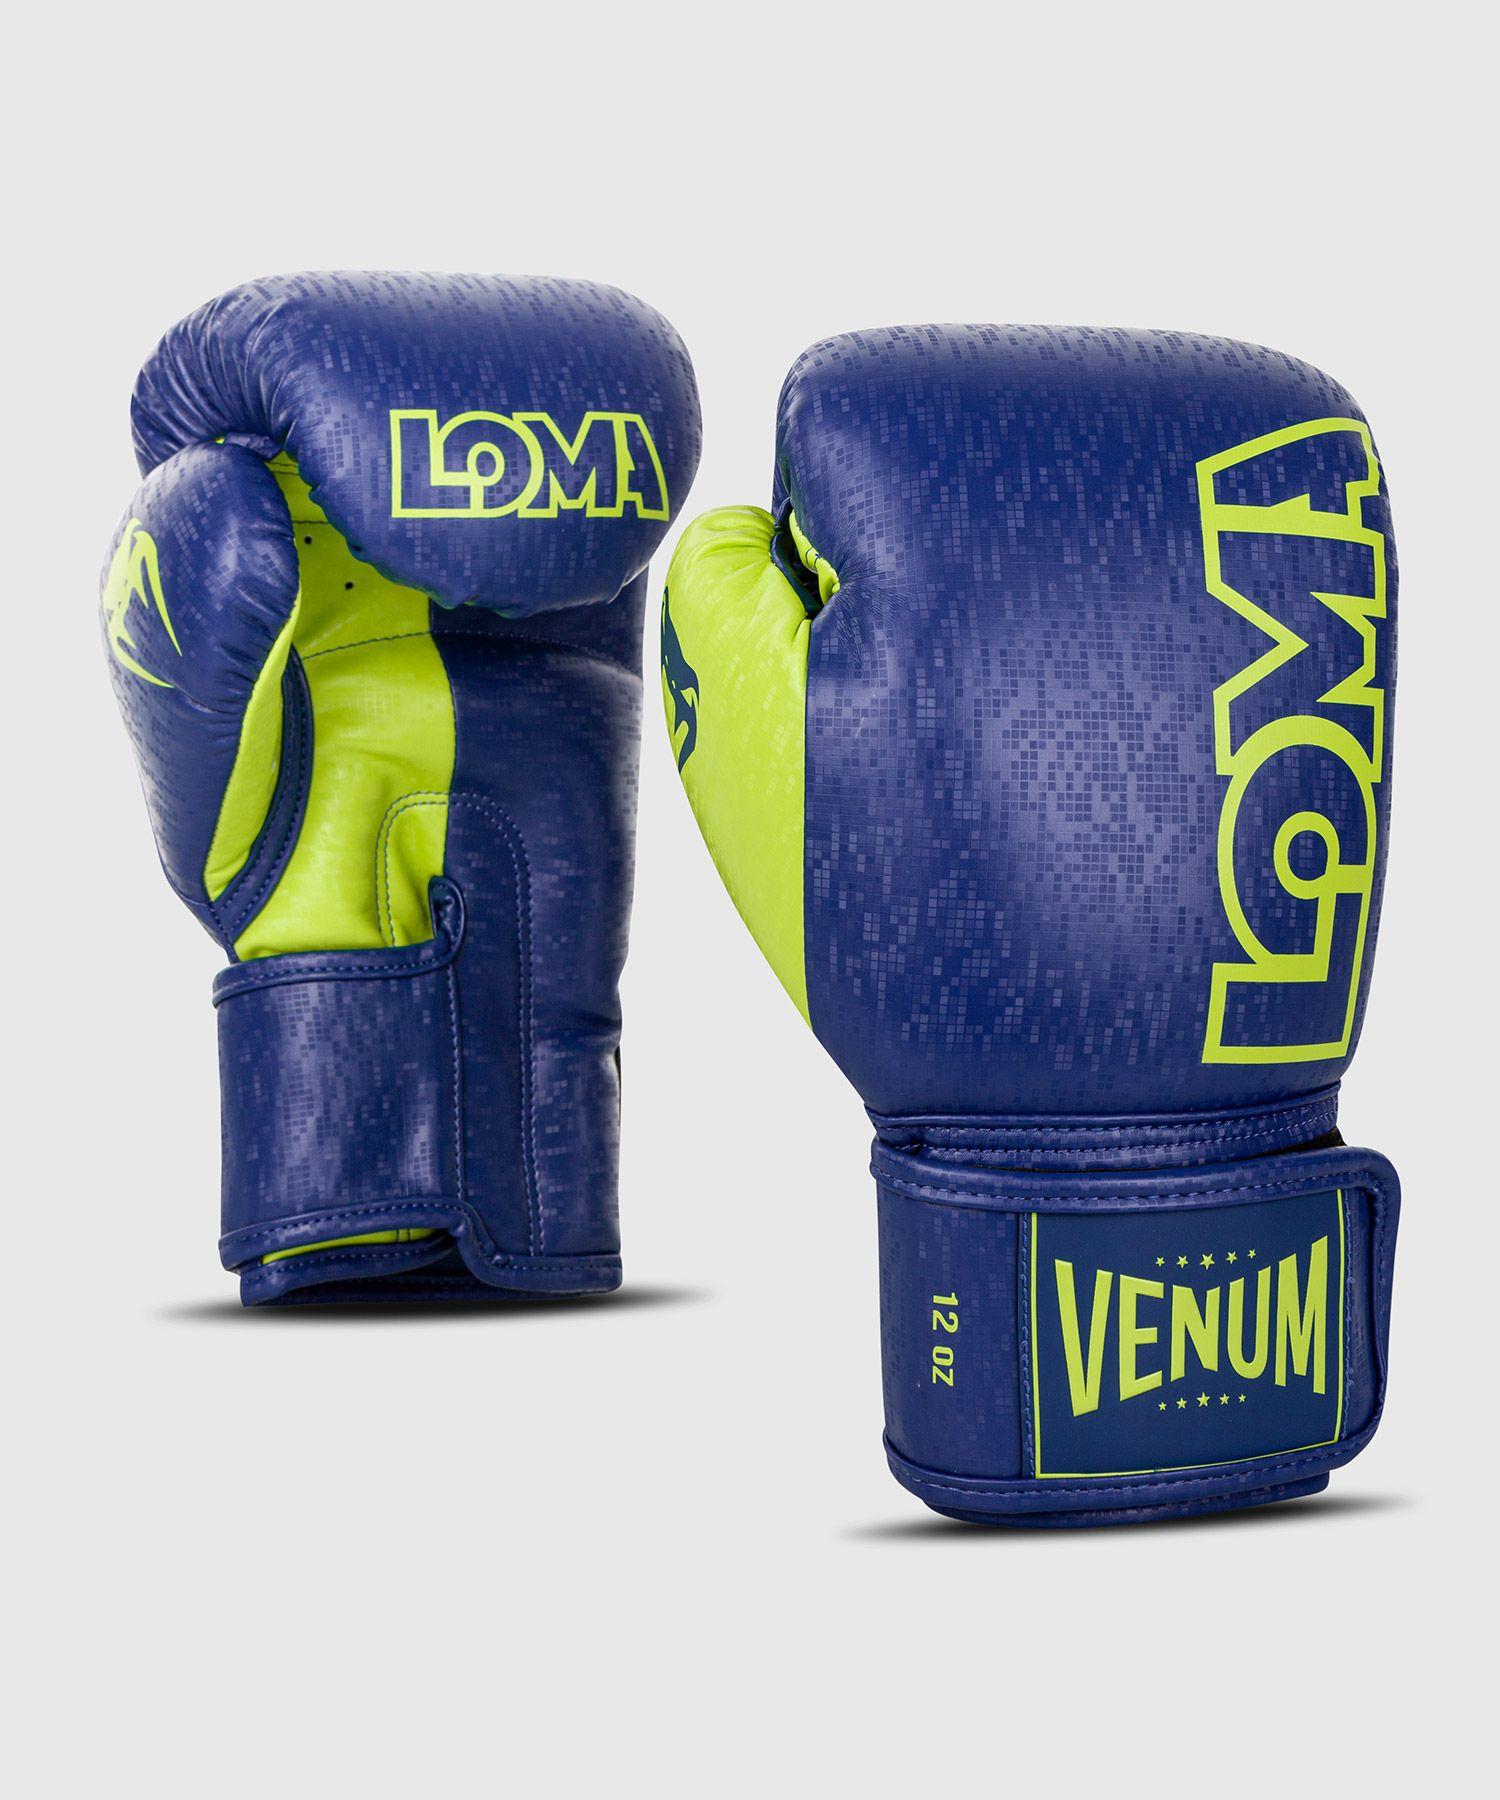 Venum Origins Boxing Gloves Loma Edition